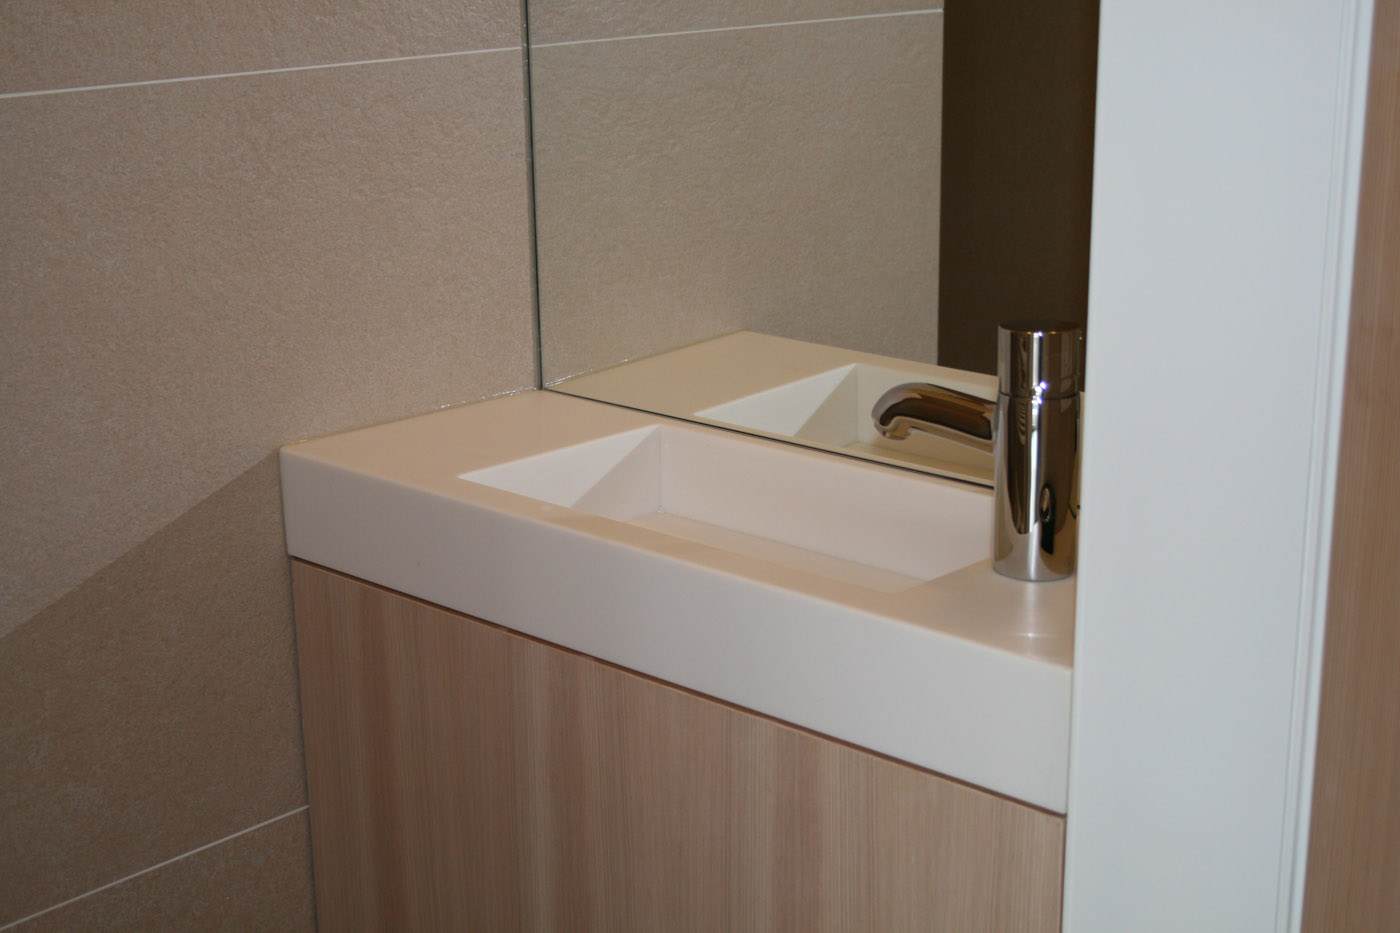 Nieuwe Badkamer Limburg : Denova keukens badkamer en meubels op maat regio torhout brugge